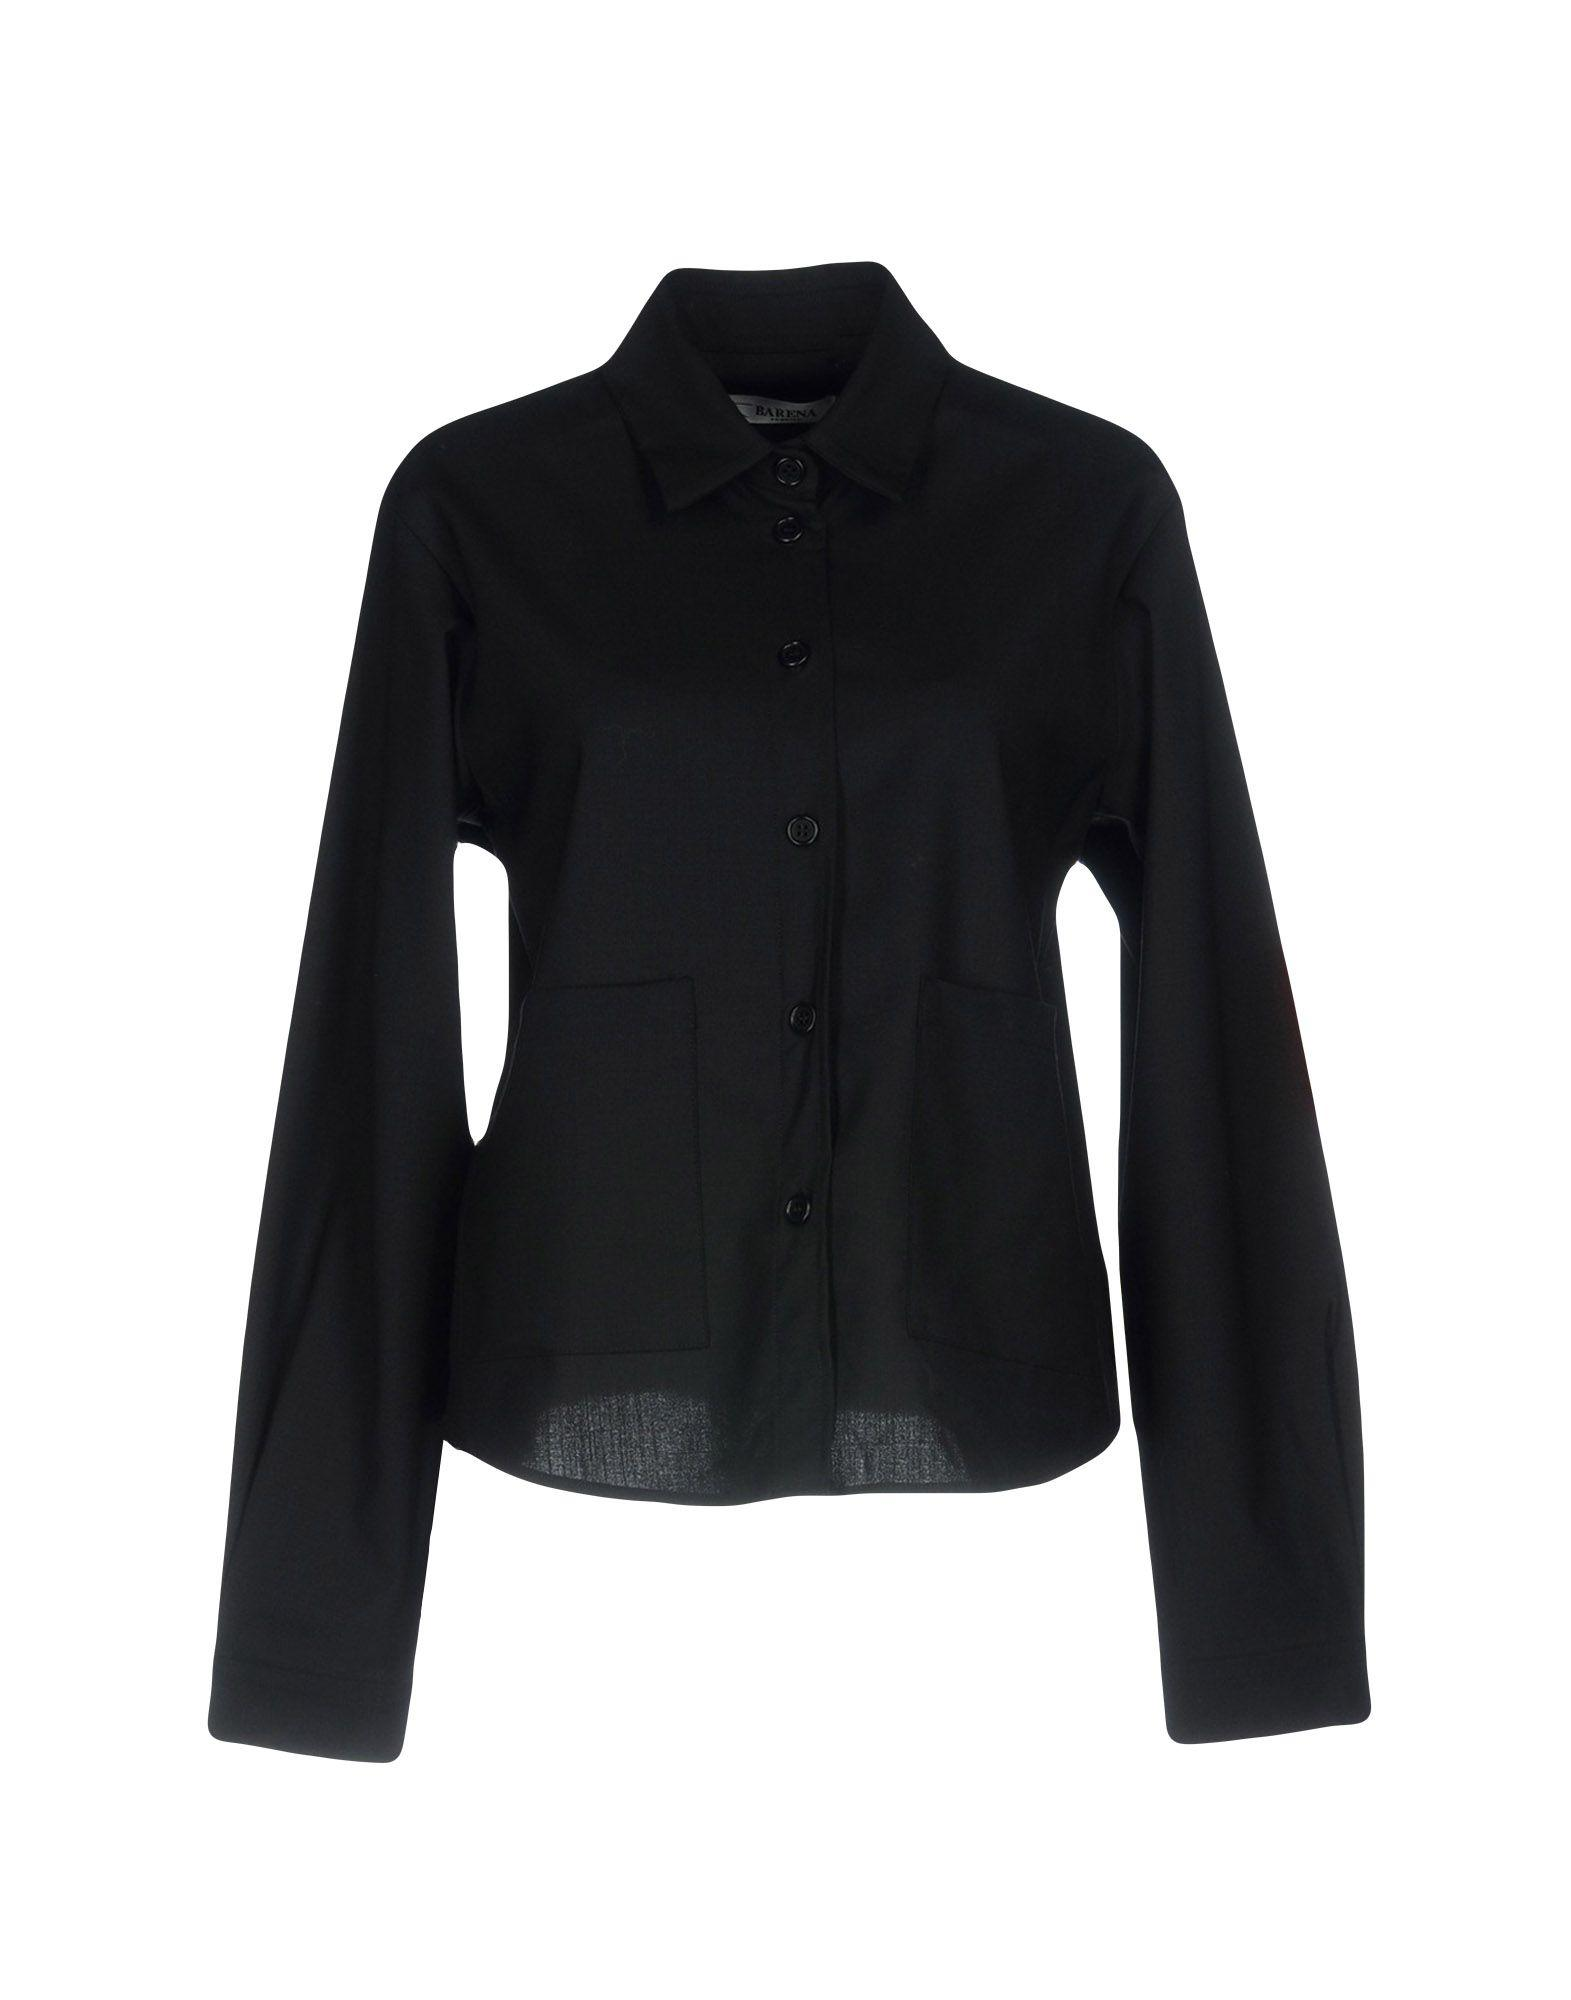 Barena Venezia Shirts In Black